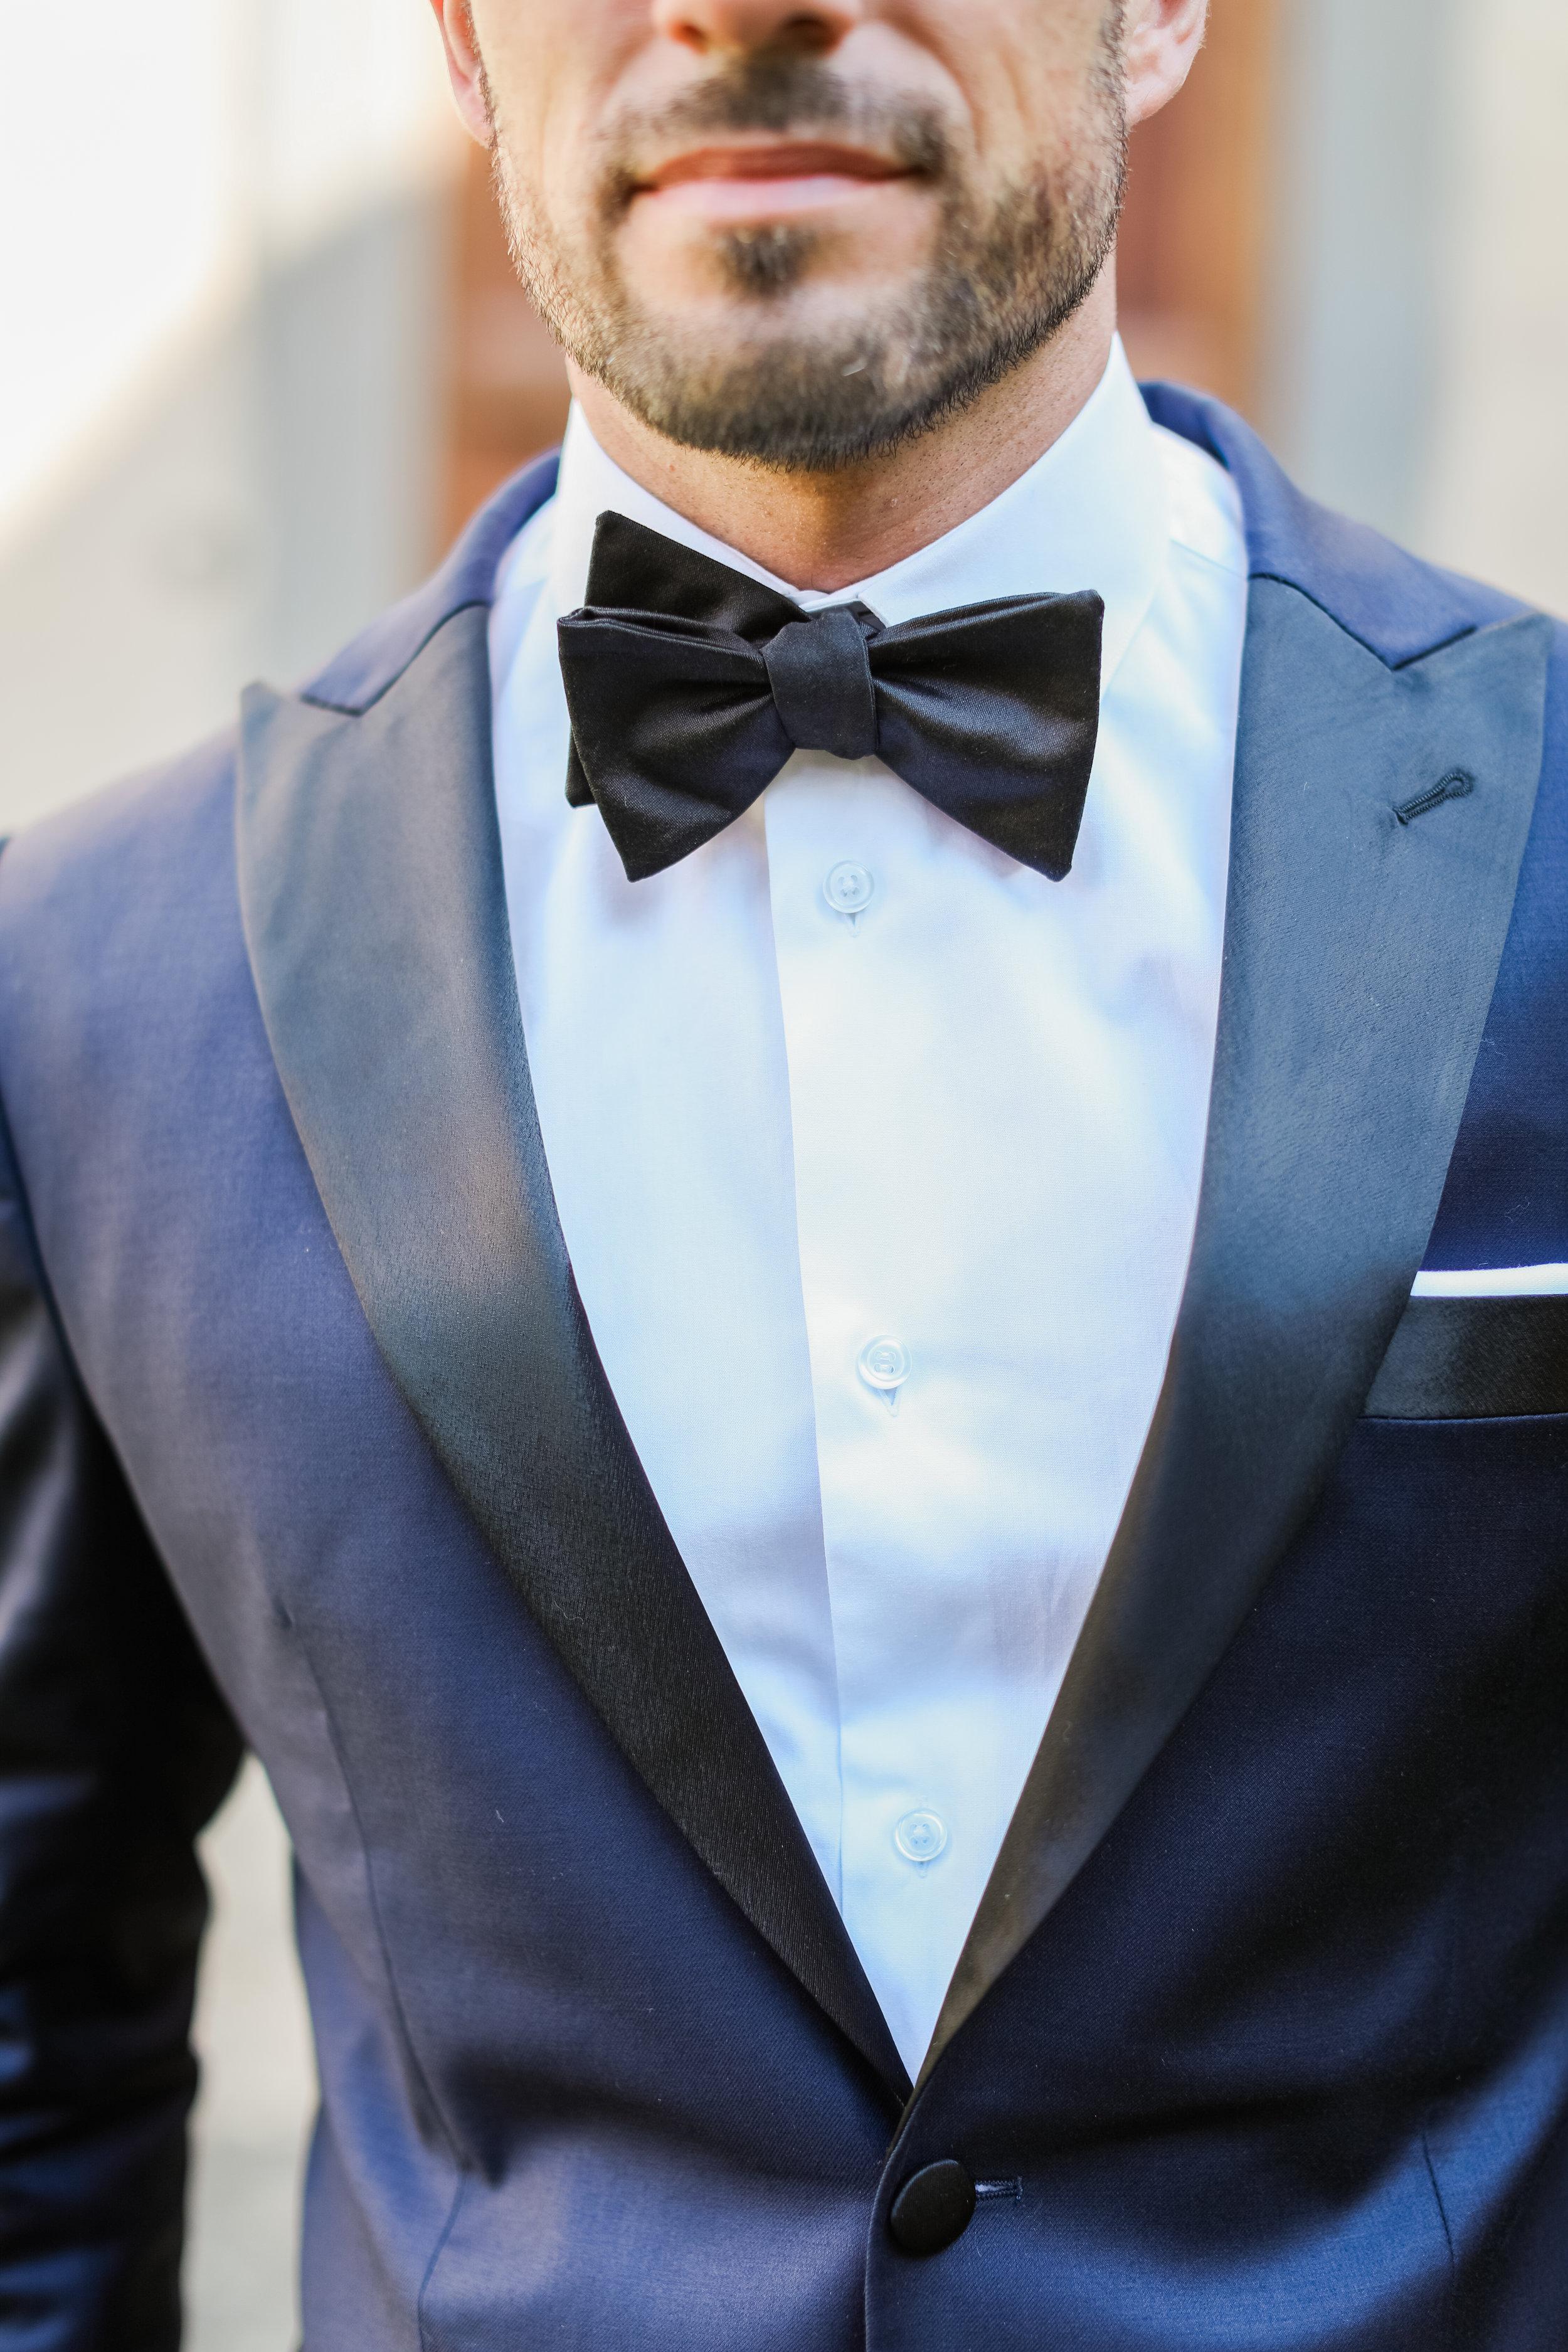 tuscany-wedding-photographer-17.jpg